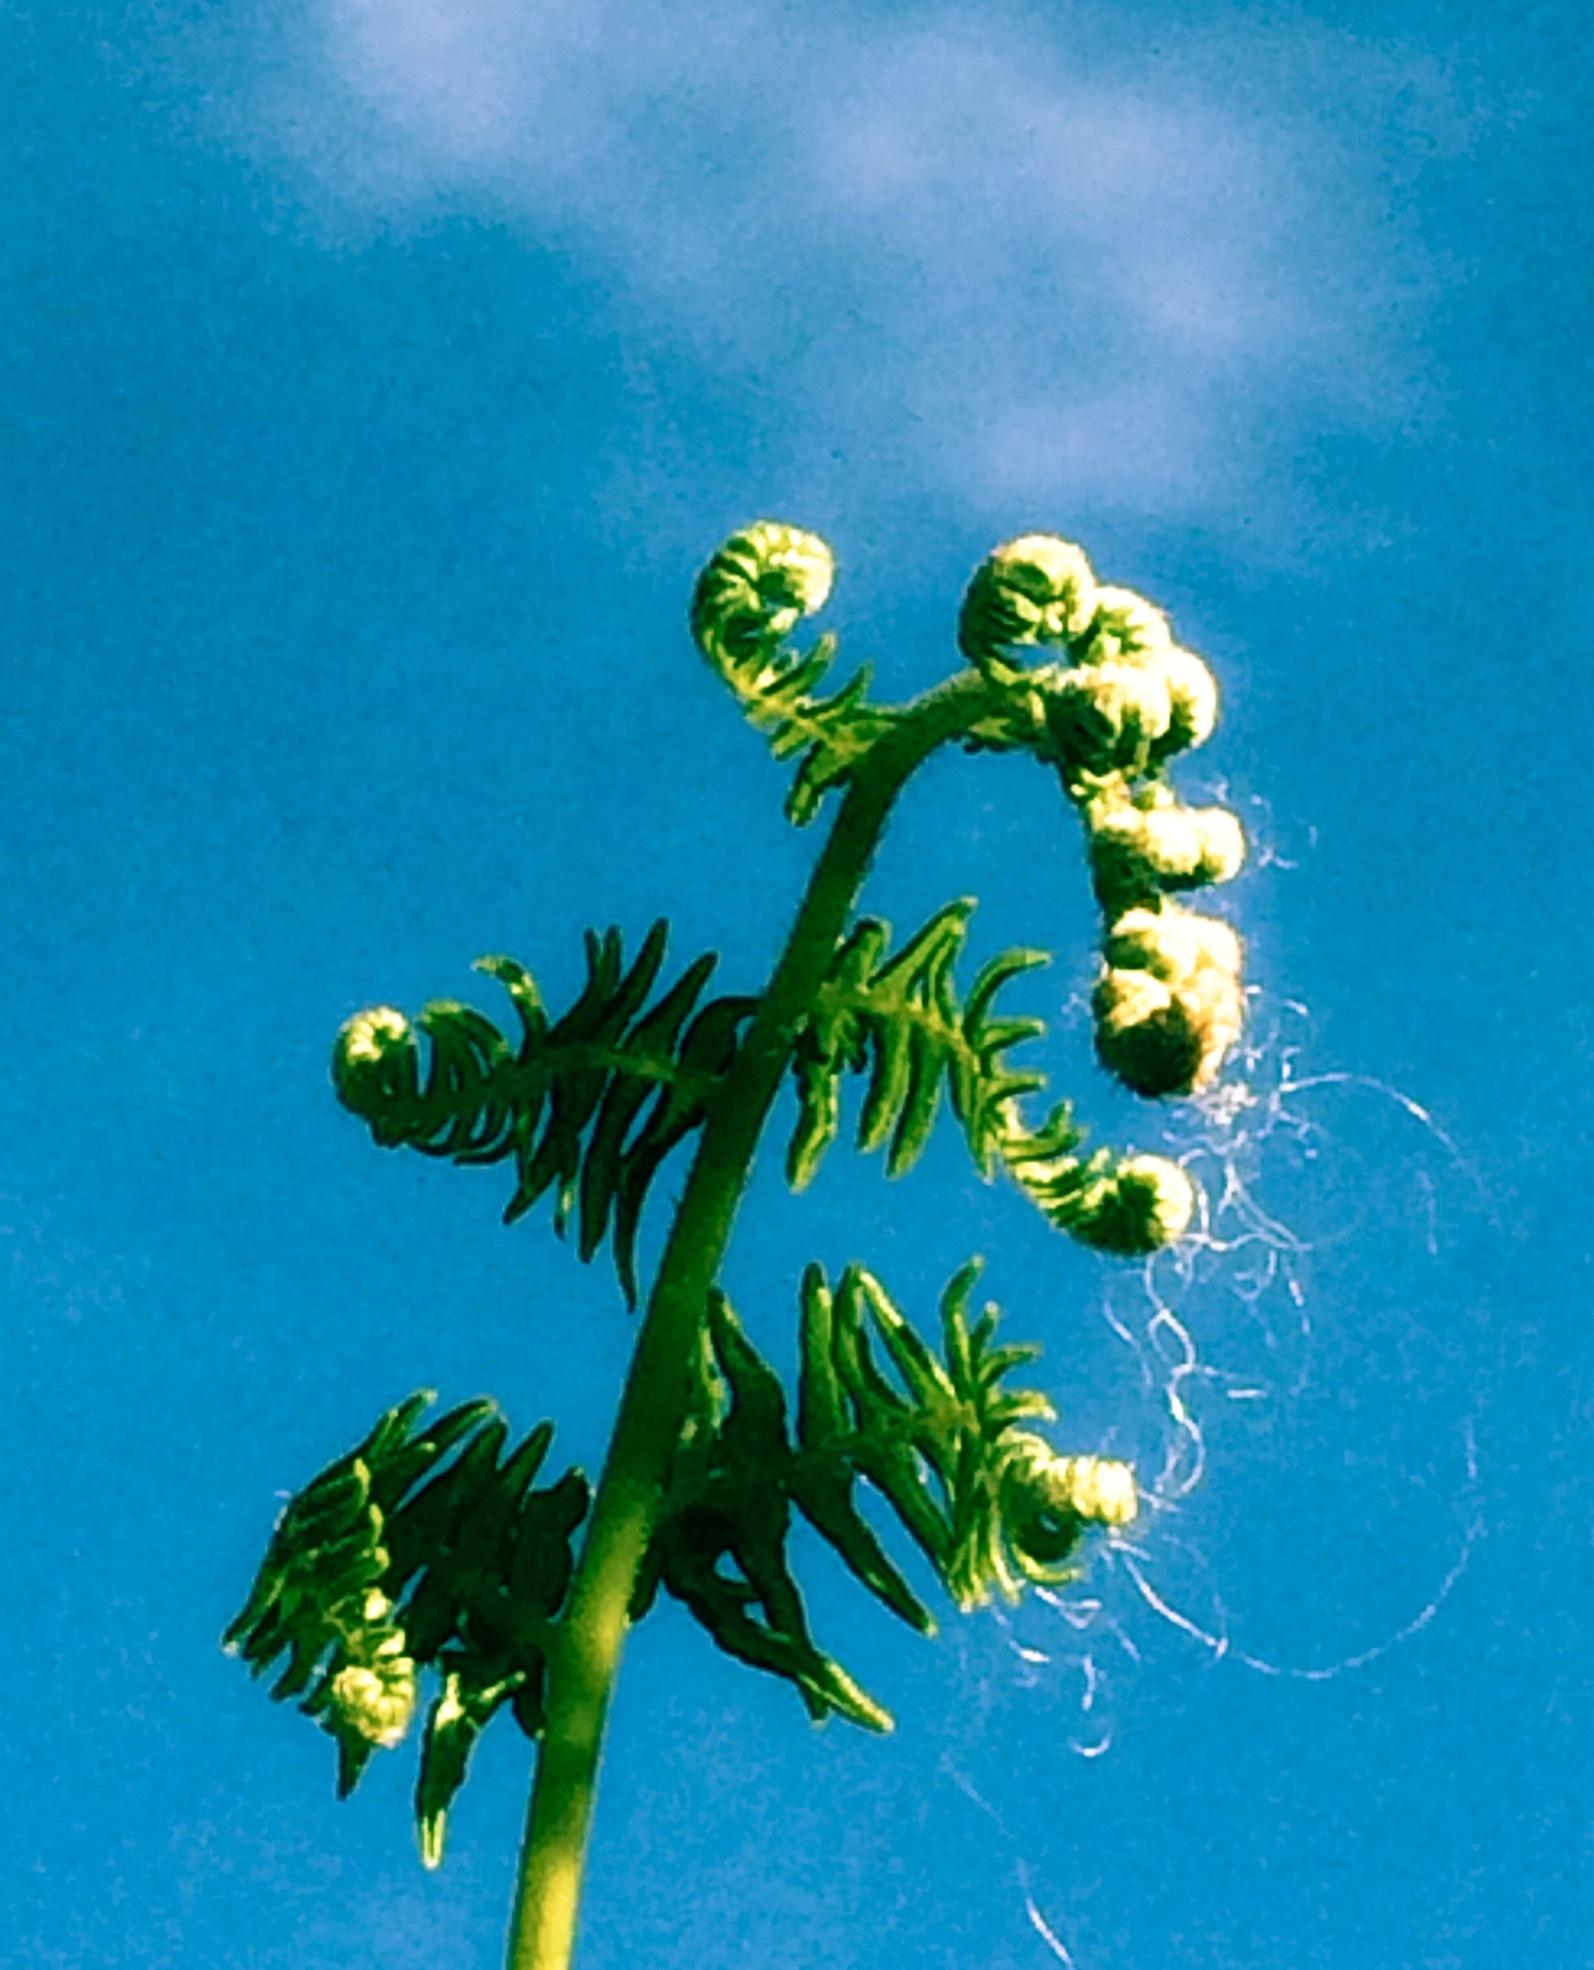 Curly Fern by Tracey Glazebrook